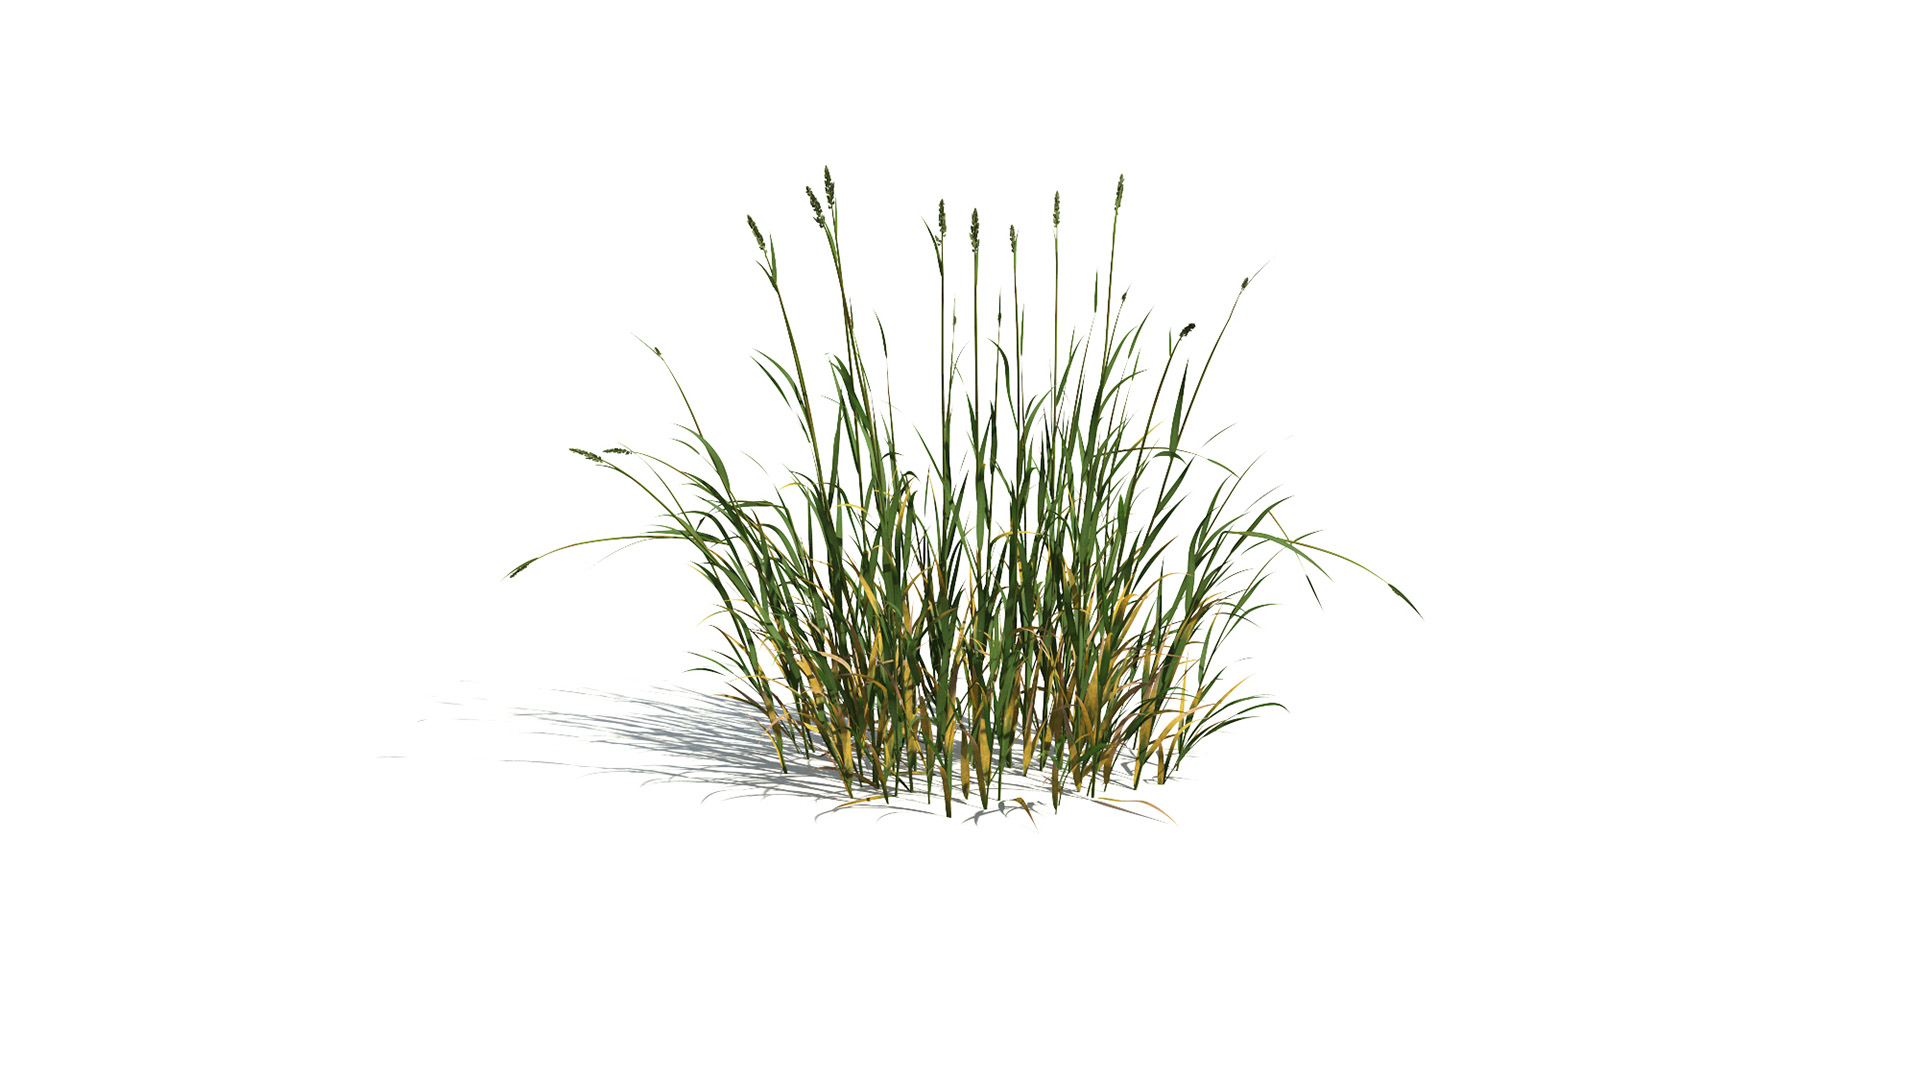 3D model of the Reed canary grass Phalaris arundinacea